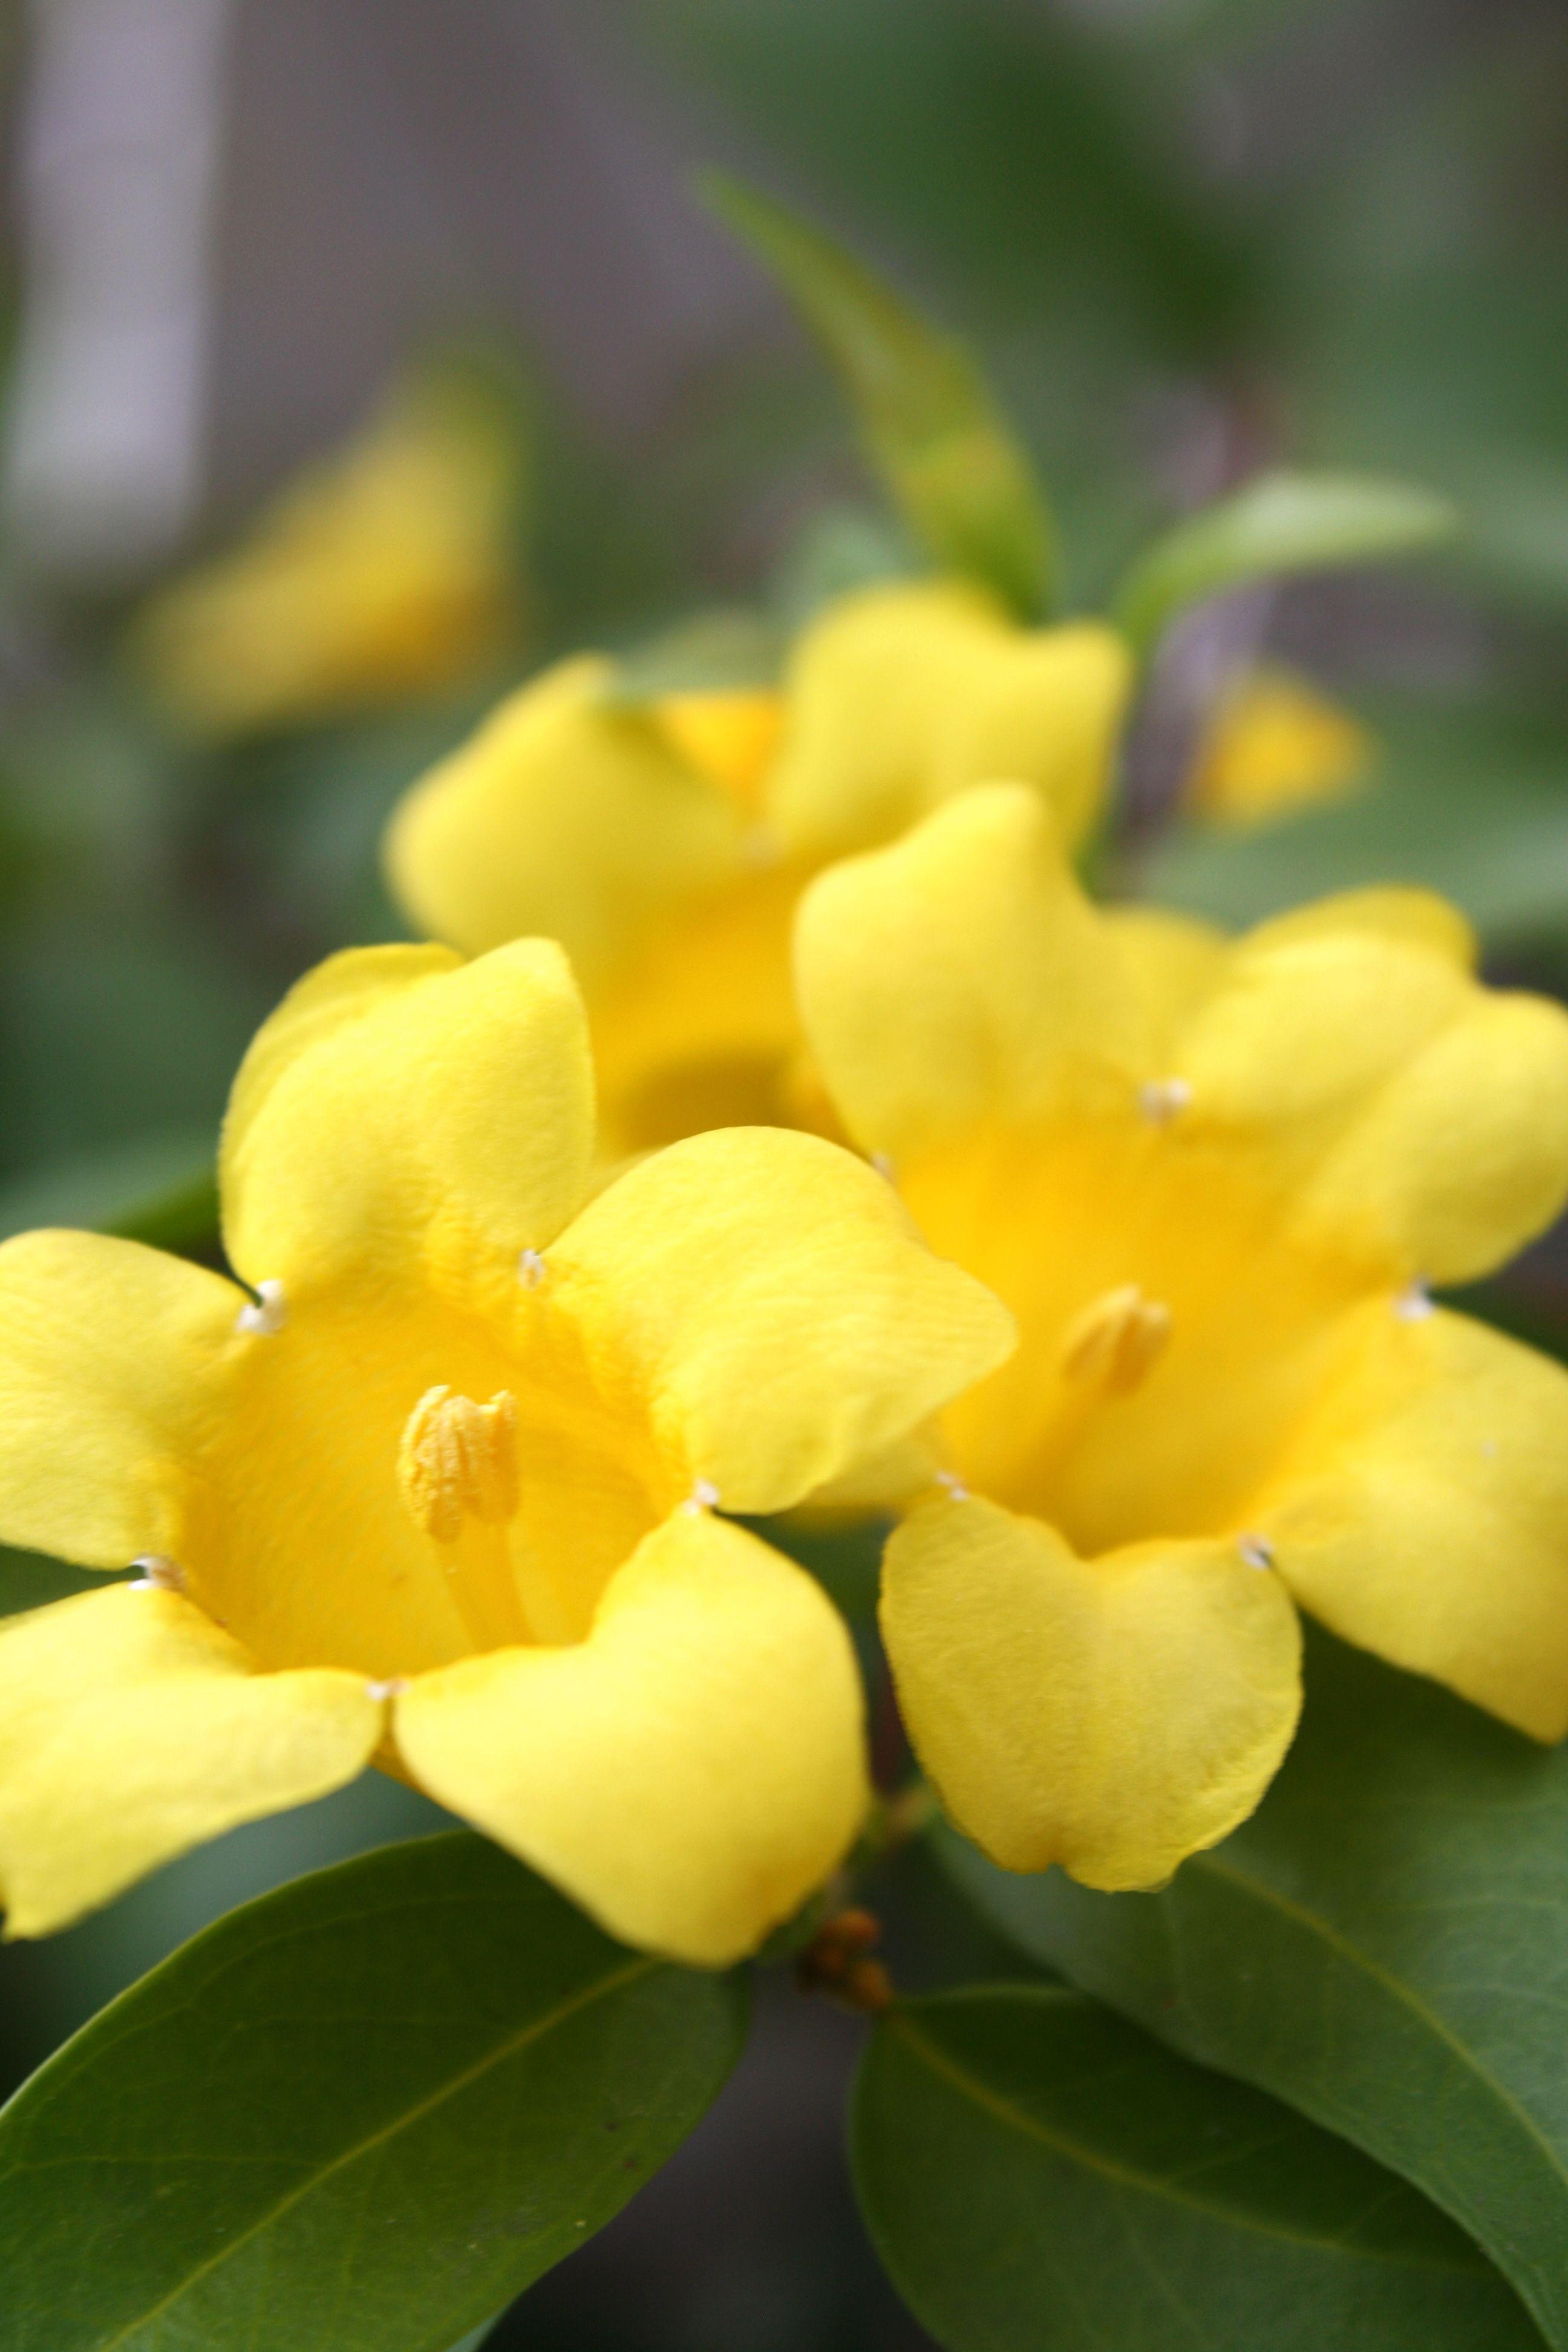 Confederate jasmine is a very small flower that grows on a vine it confederate jasmine is a very small flower that grows on a vine it is beautiful izmirmasajfo